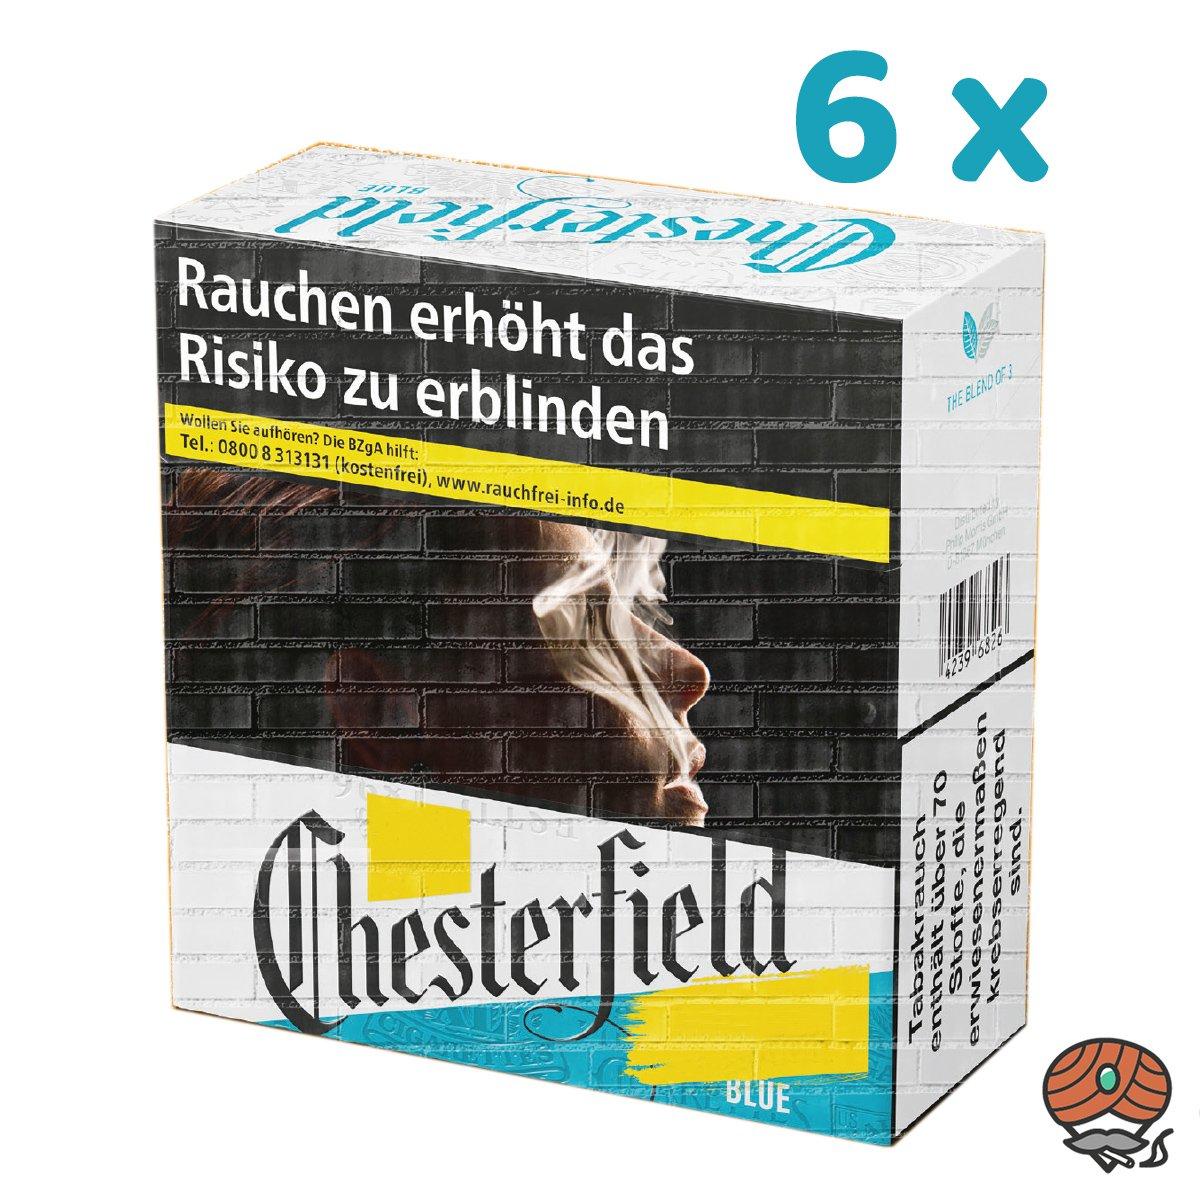 1 Stange Chesterfield BLUE / BLAU Zigaretten - 6 x 49 Stück